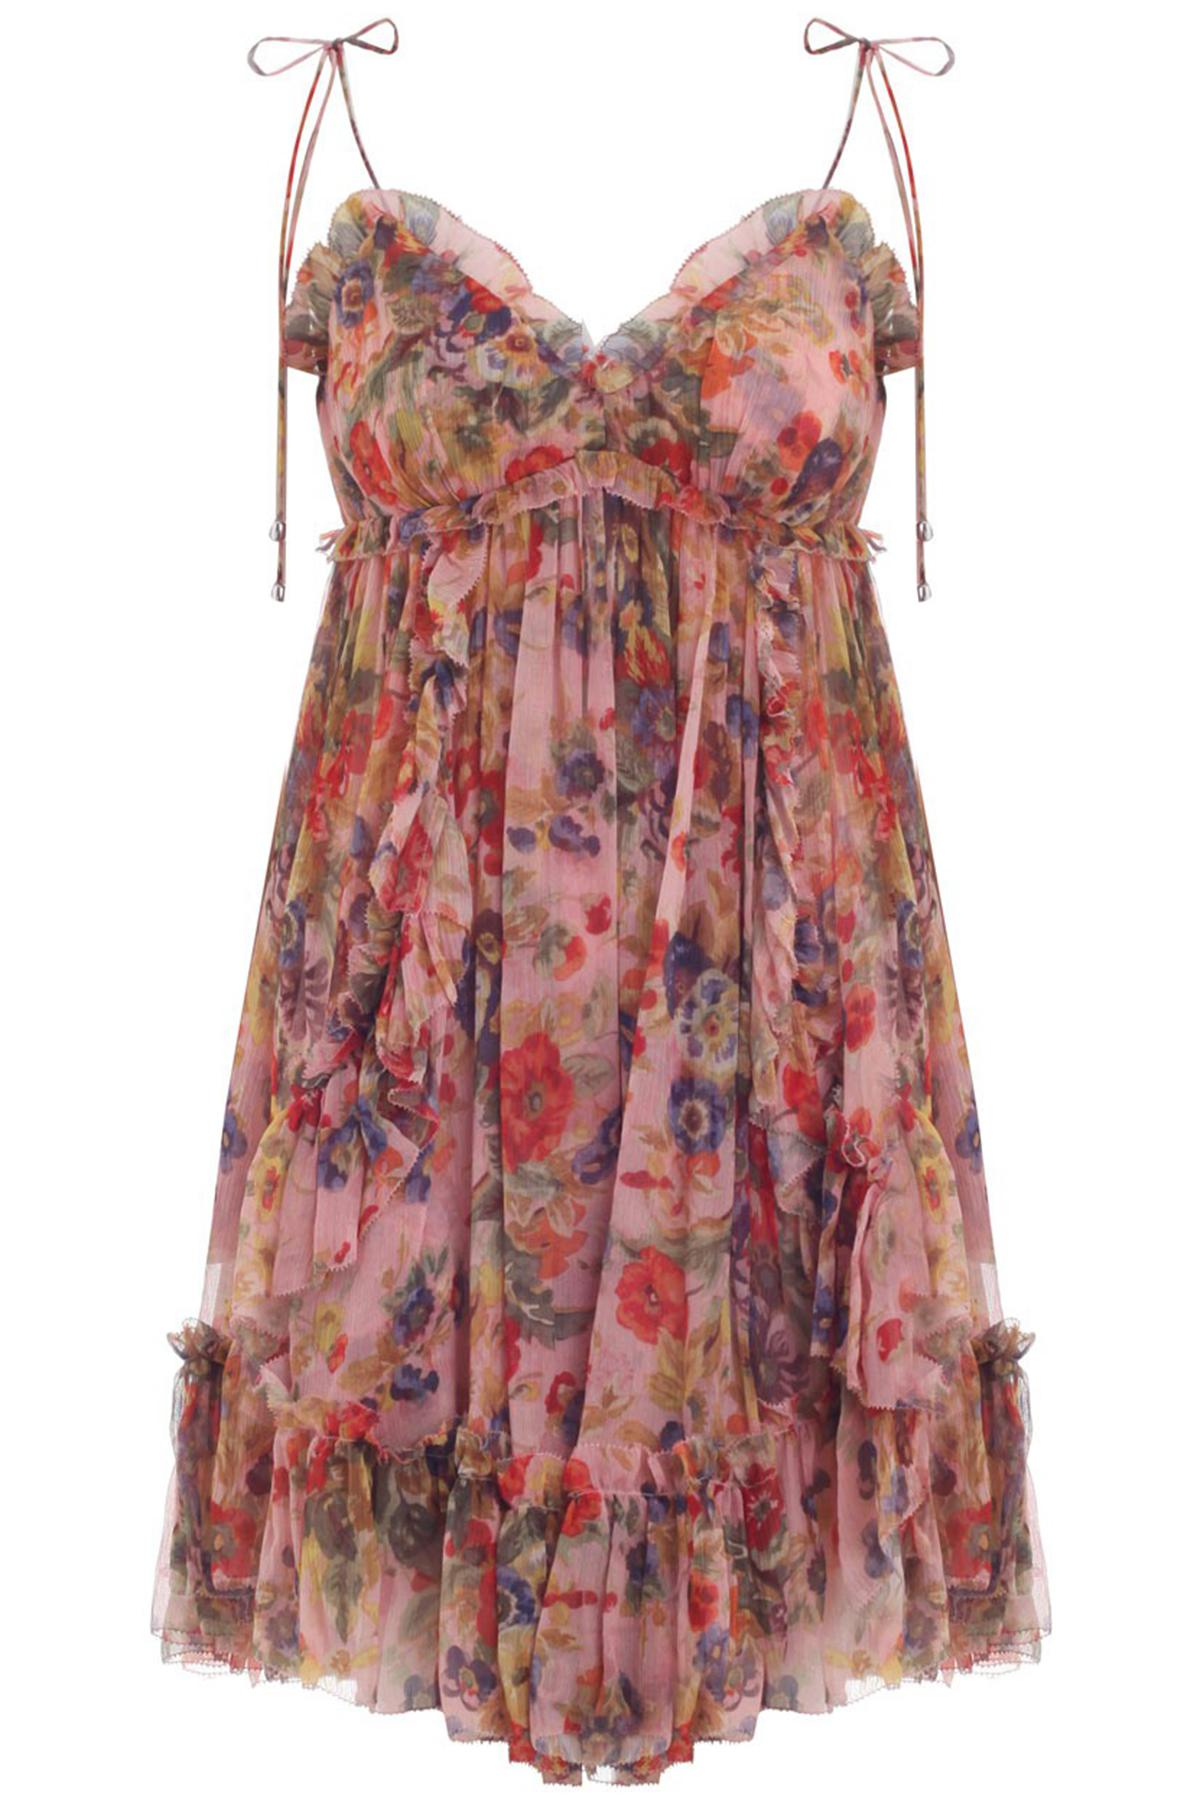 d8d8728aa992 Zimmermann Lovelorn Frill Mini Dress In Pink Floral in Pink - Lyst